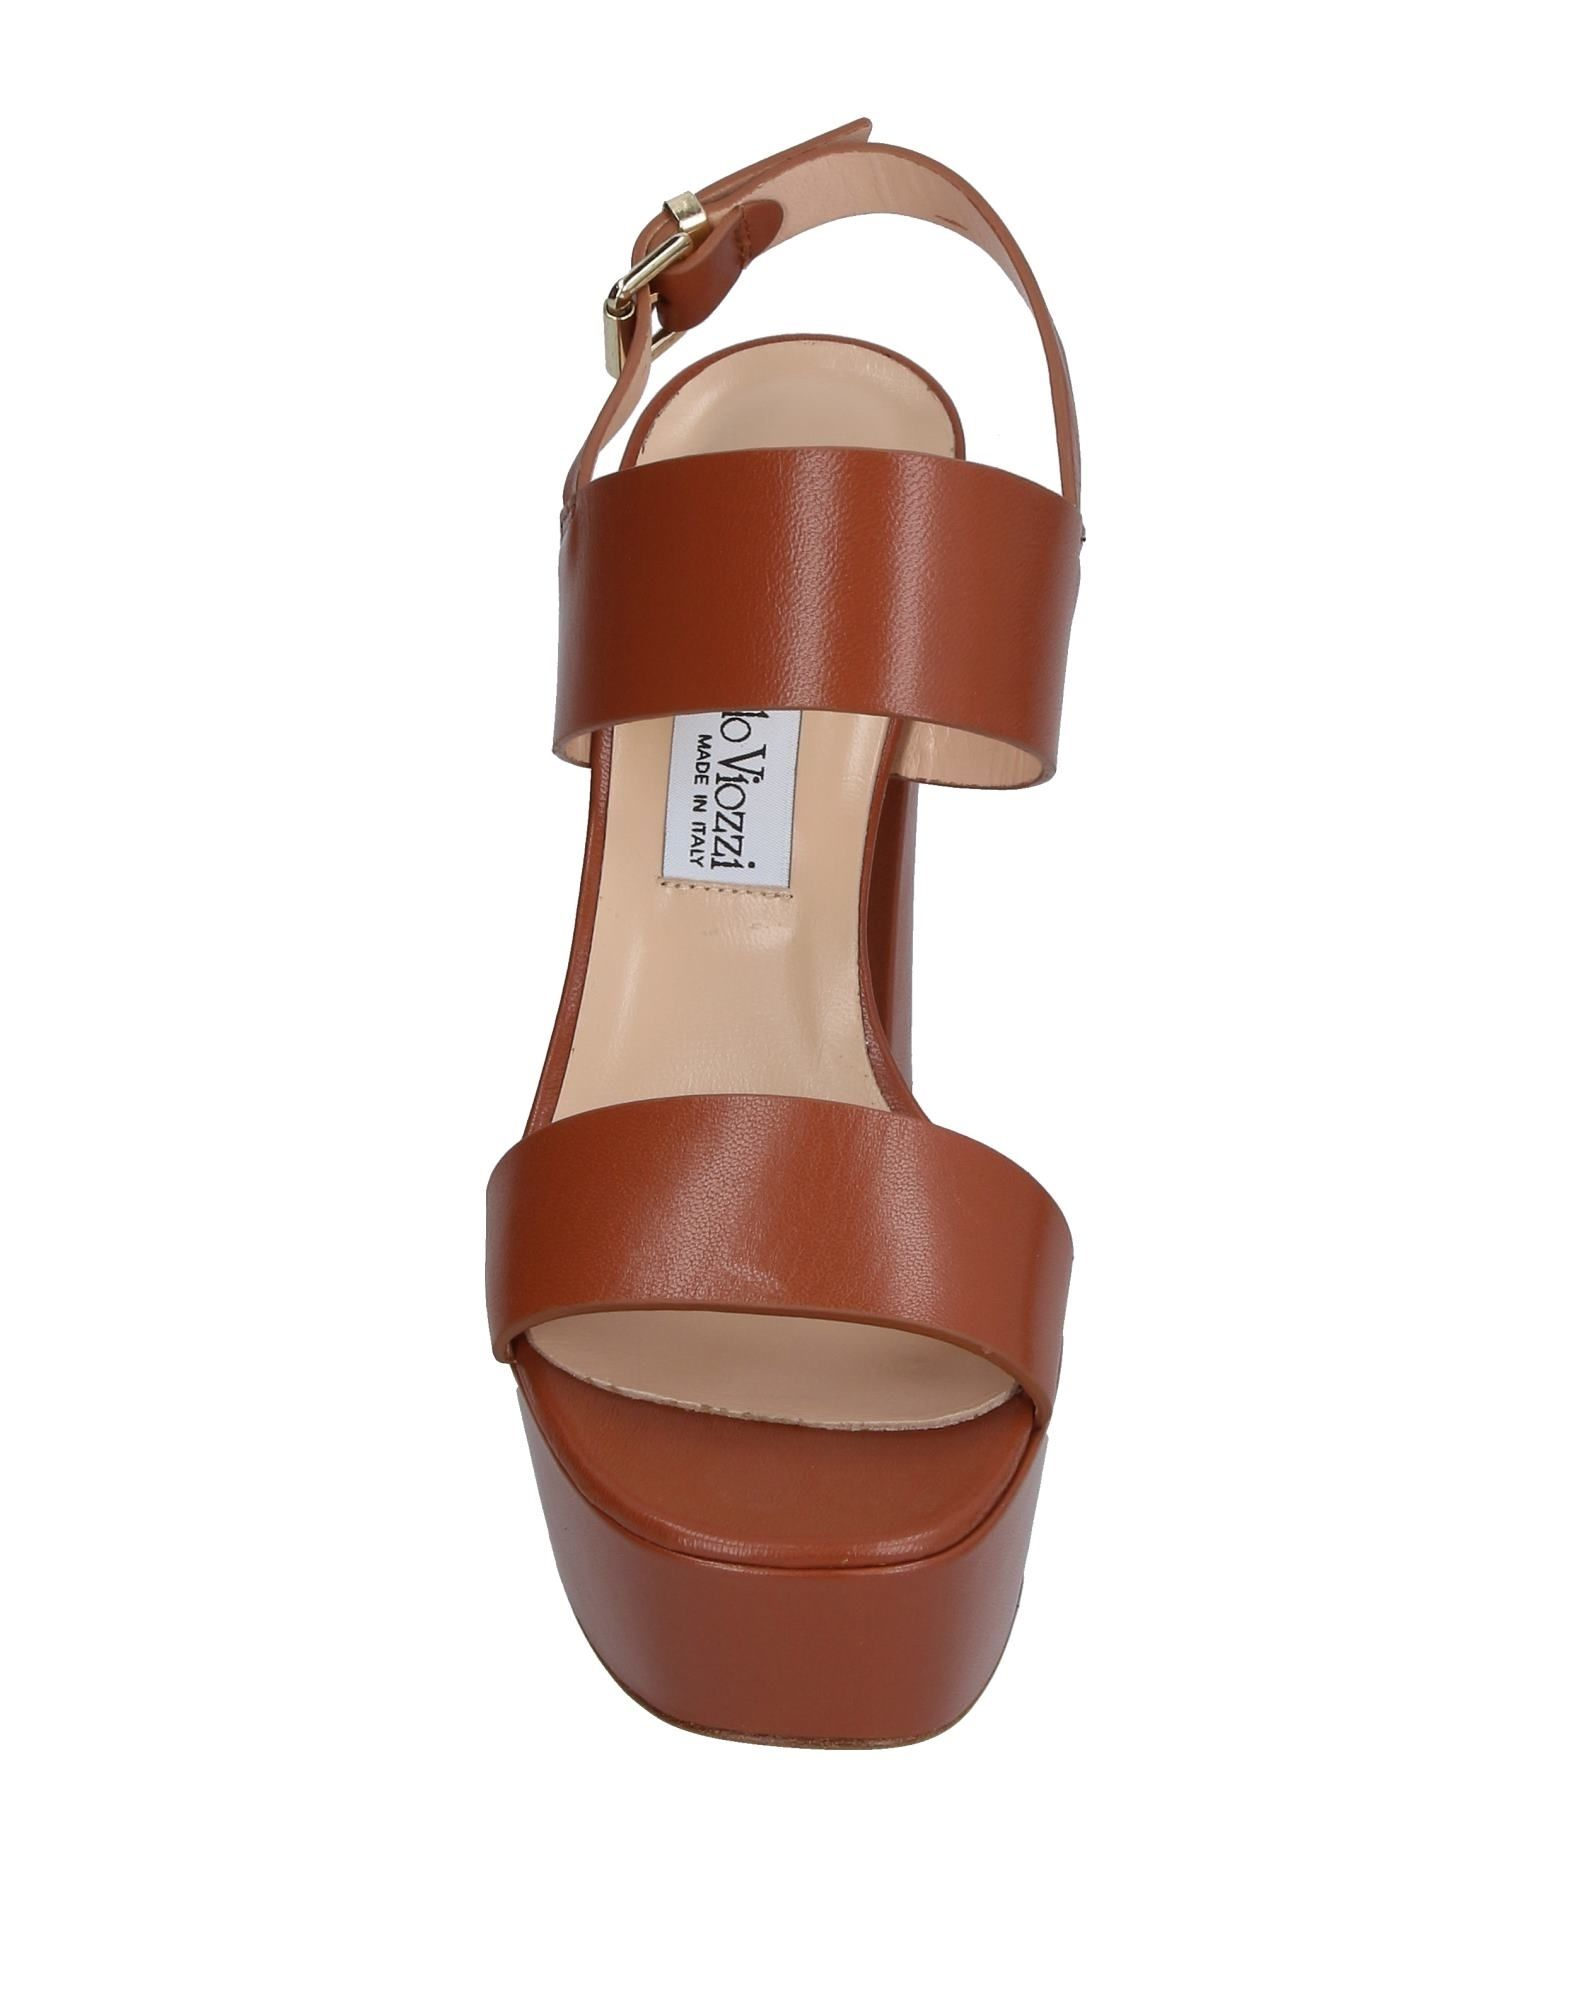 Stilvolle billige Schuhe Giampaolo 11241022FO Viozzi Sandalen Damen  11241022FO Giampaolo 166dc9